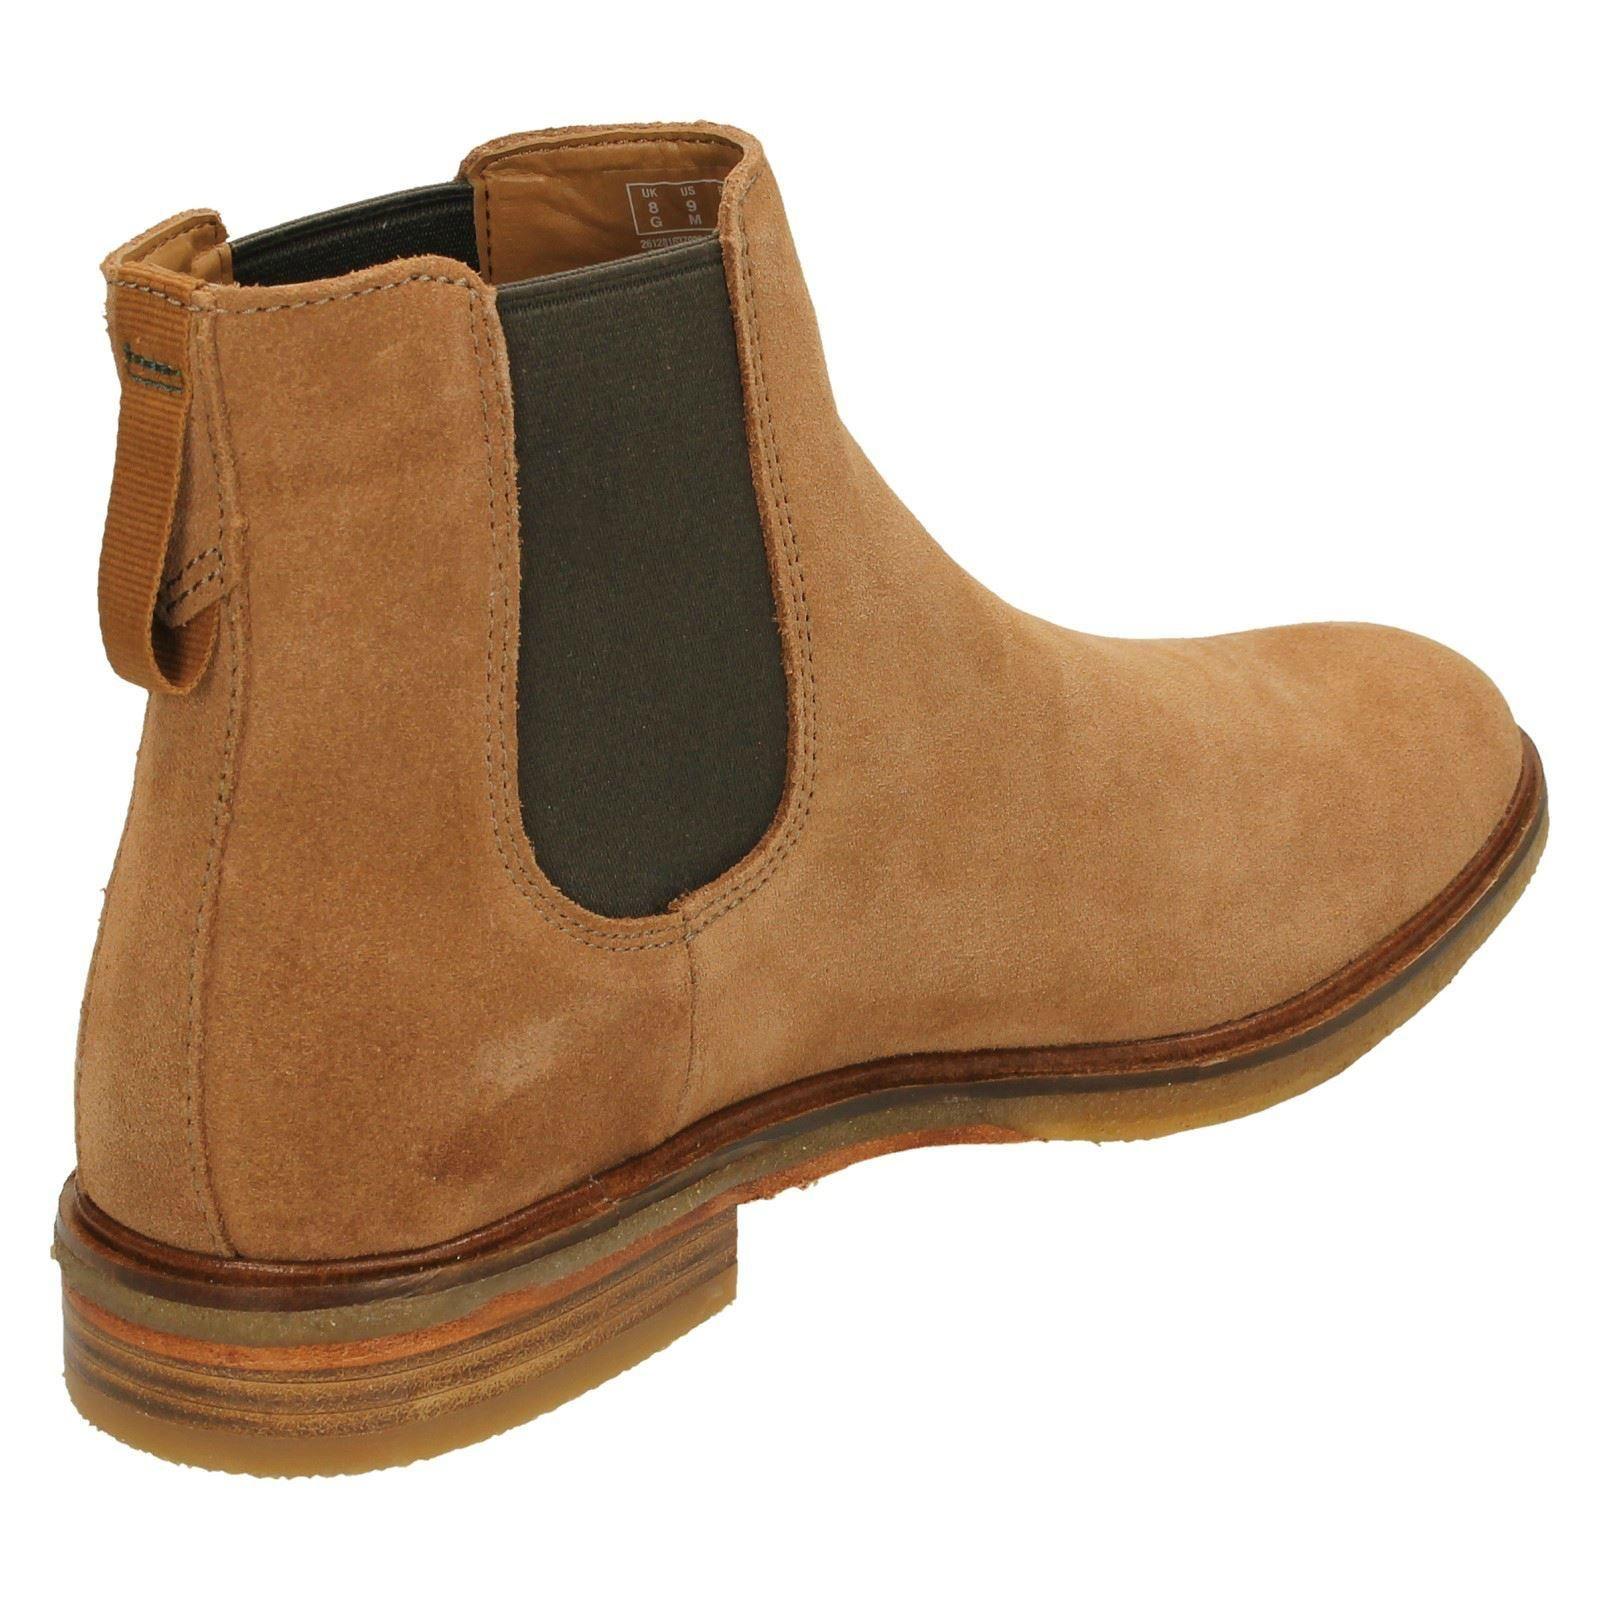 Clarks Men/'s Clarkdale Gobi Navy Chelsea Boots